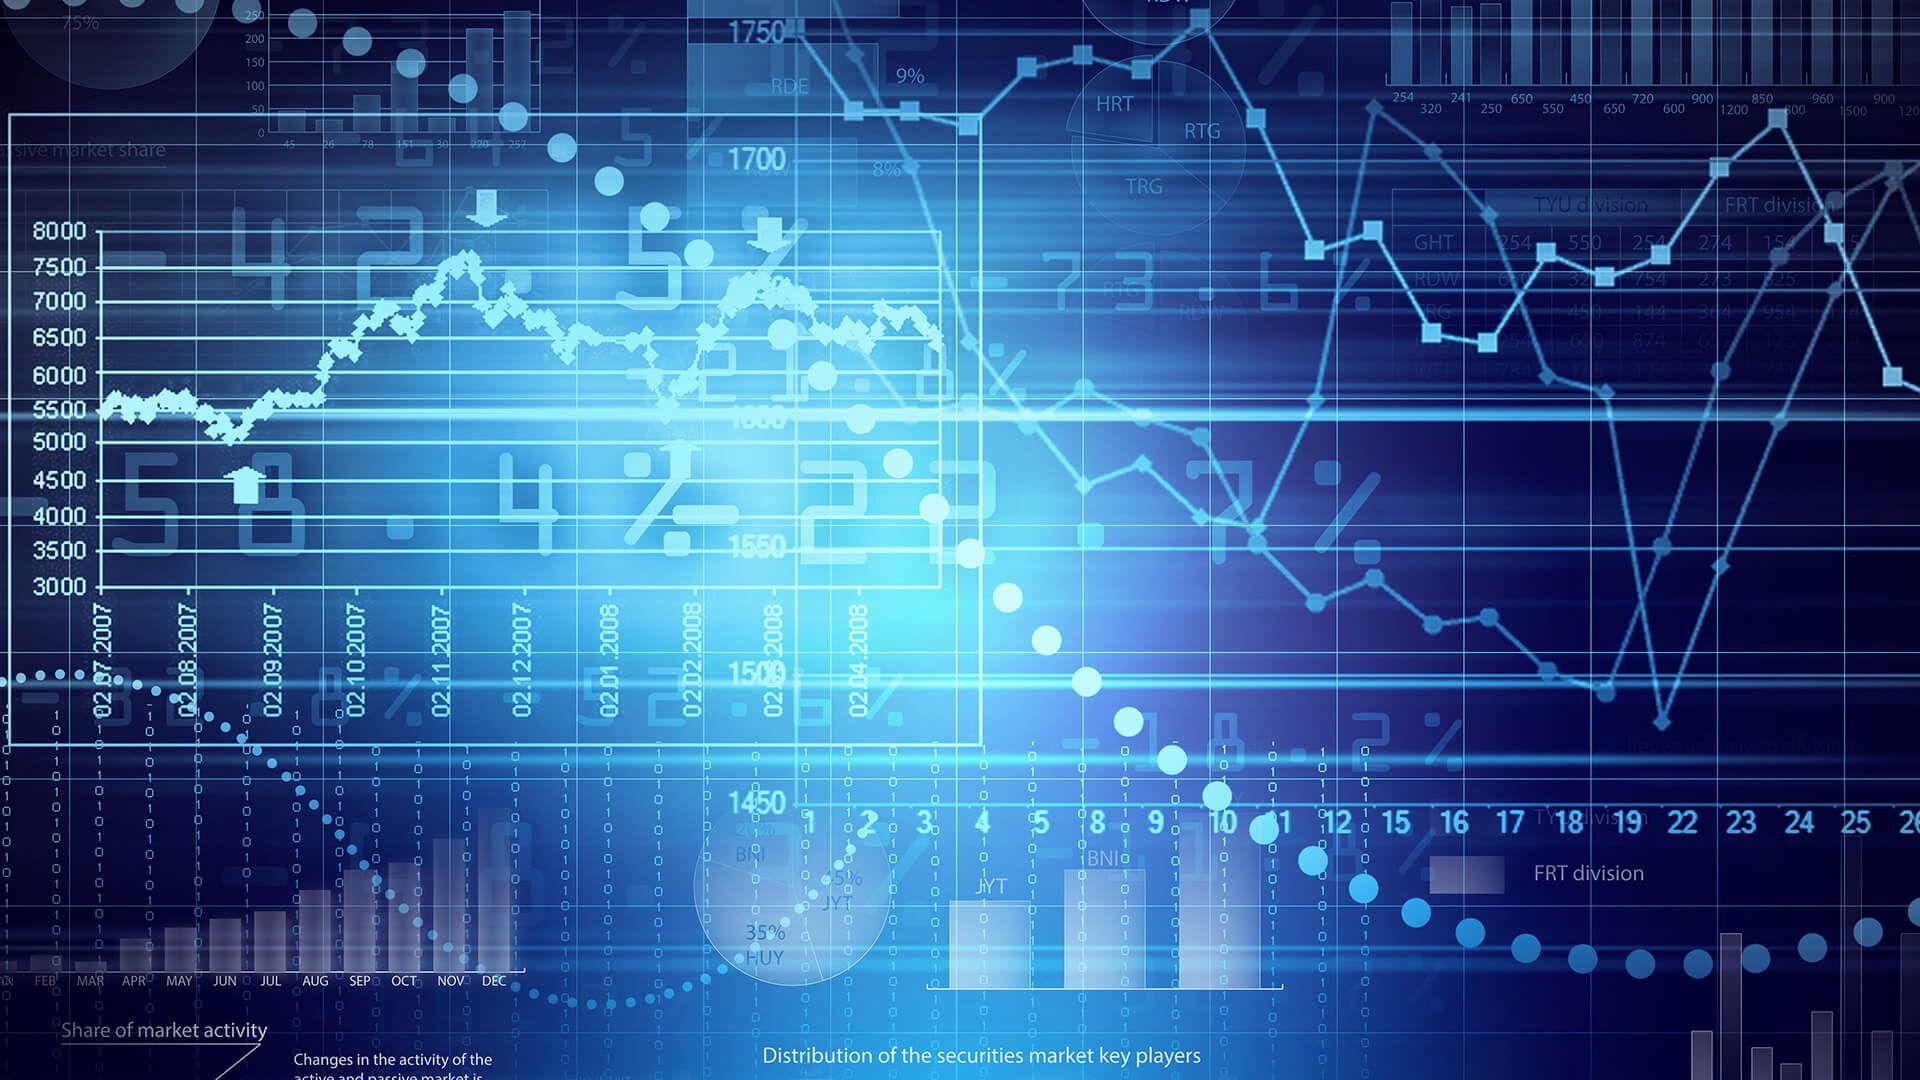 Visualizing Seo Why Visualizing Seo Data Matters Machine